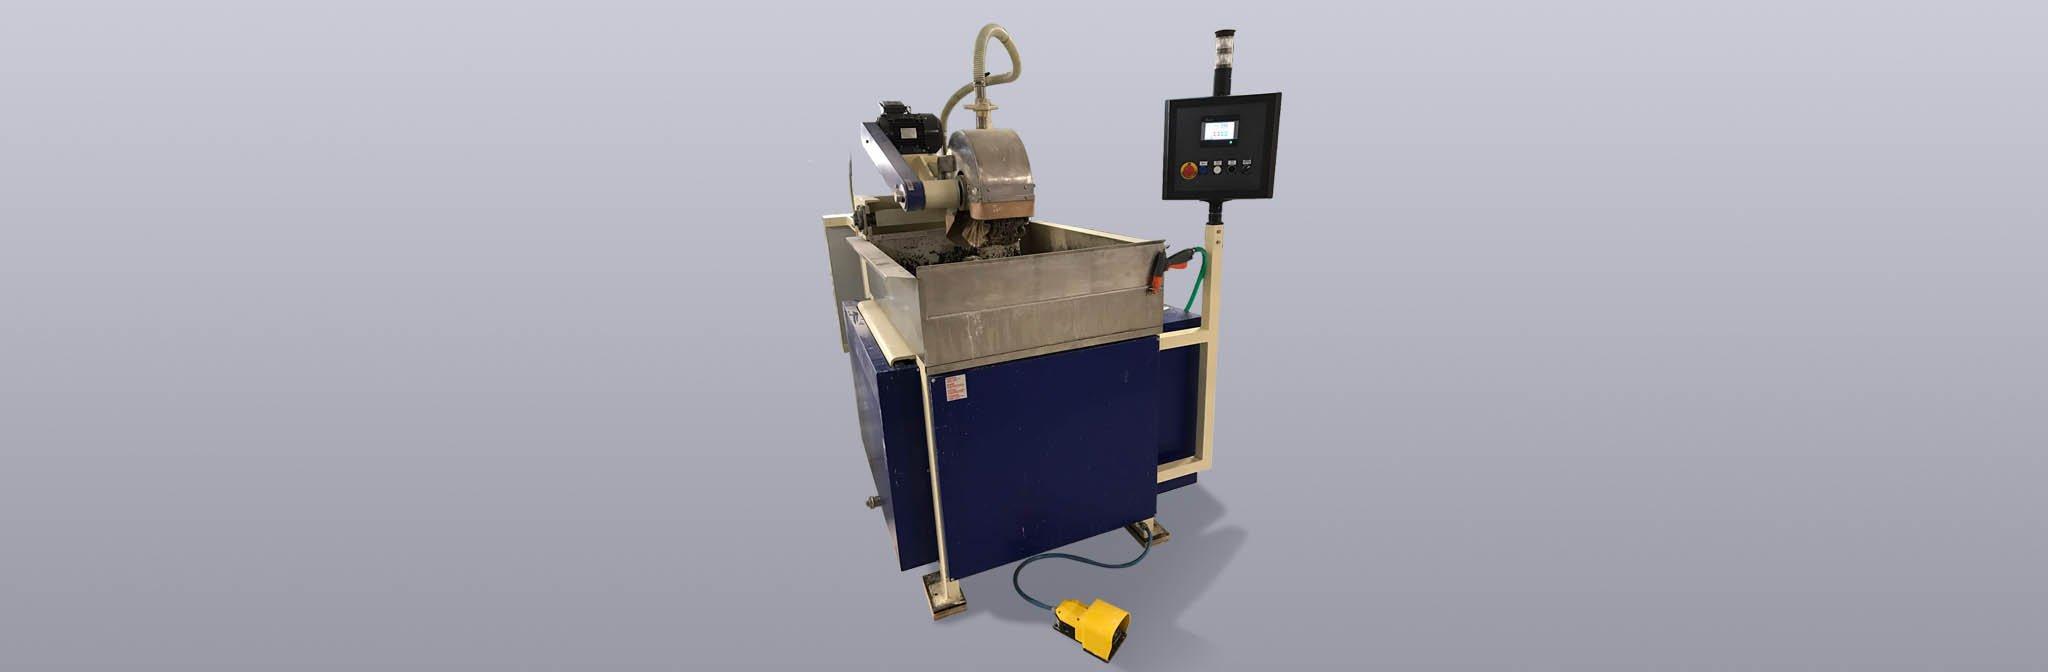 Polishing machine LX1 hollow glass